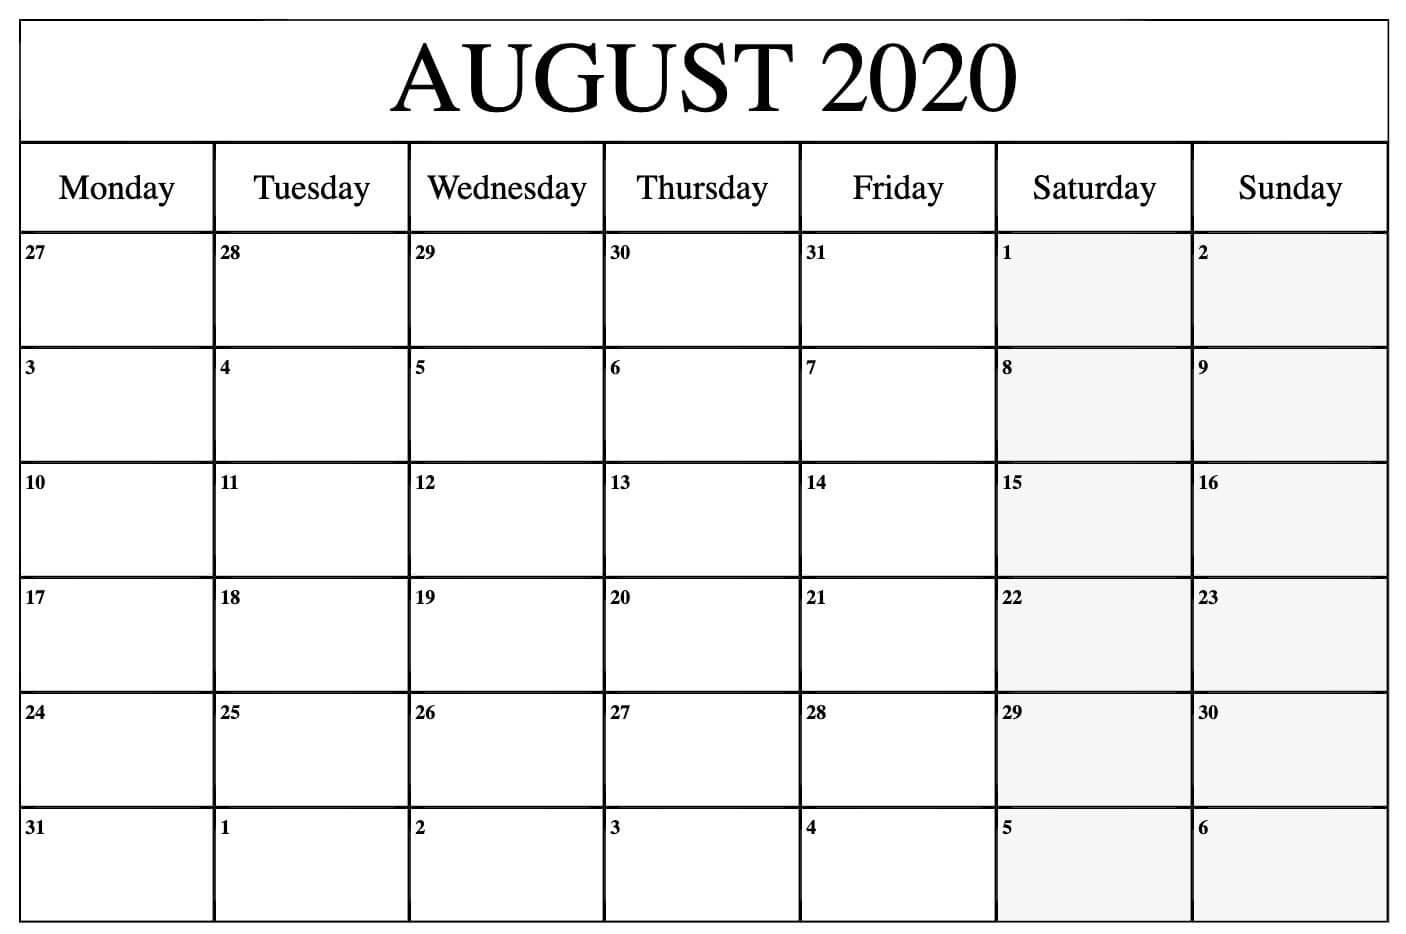 August 2020 Calendar Holidays Printable